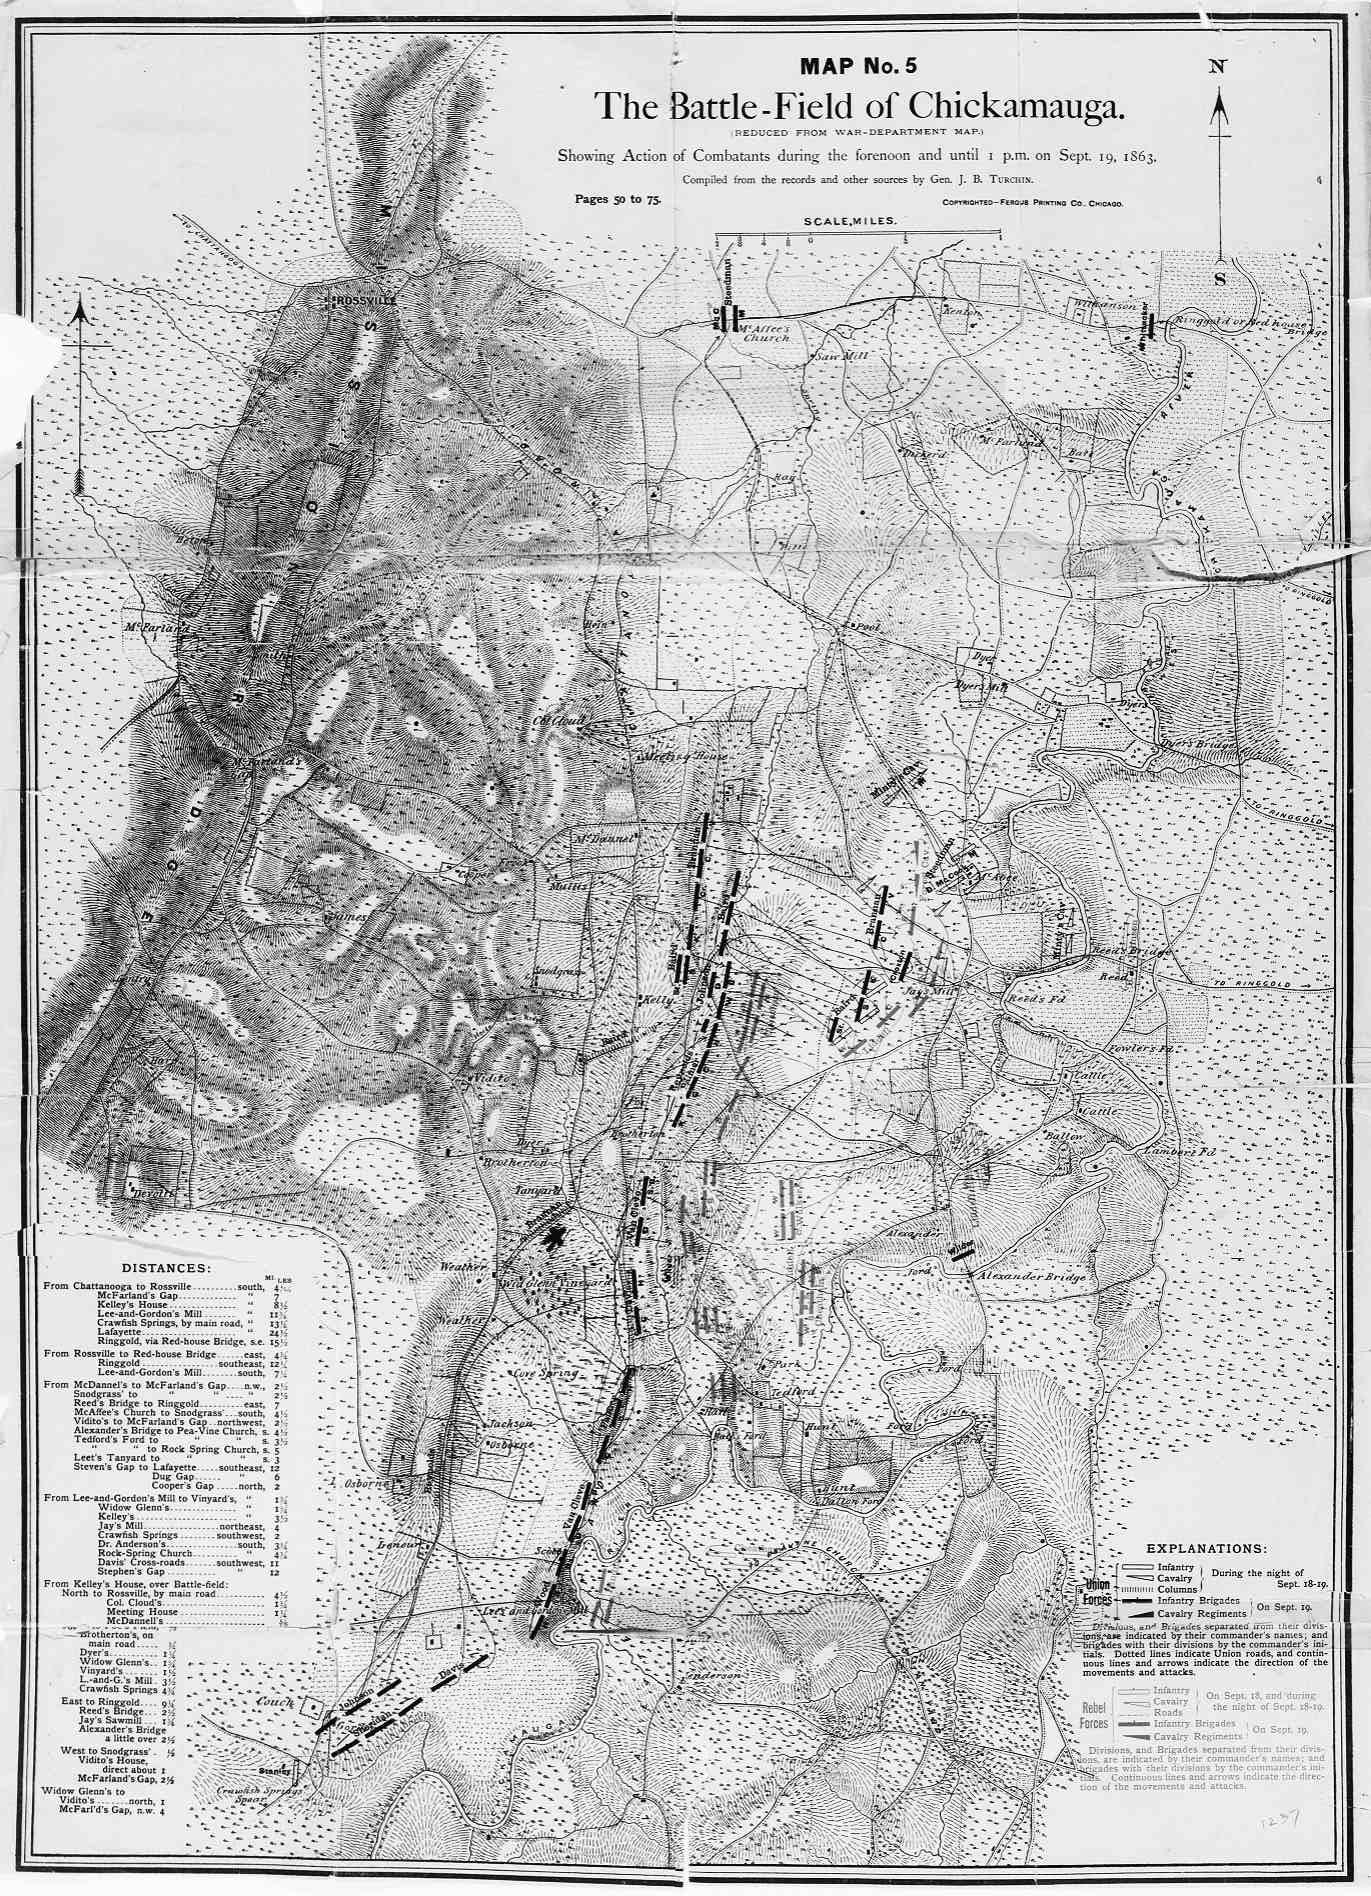 FileThe Battlefield At Chickamauga Fergus Jpg Wikimedia - Battle of chickamauga map